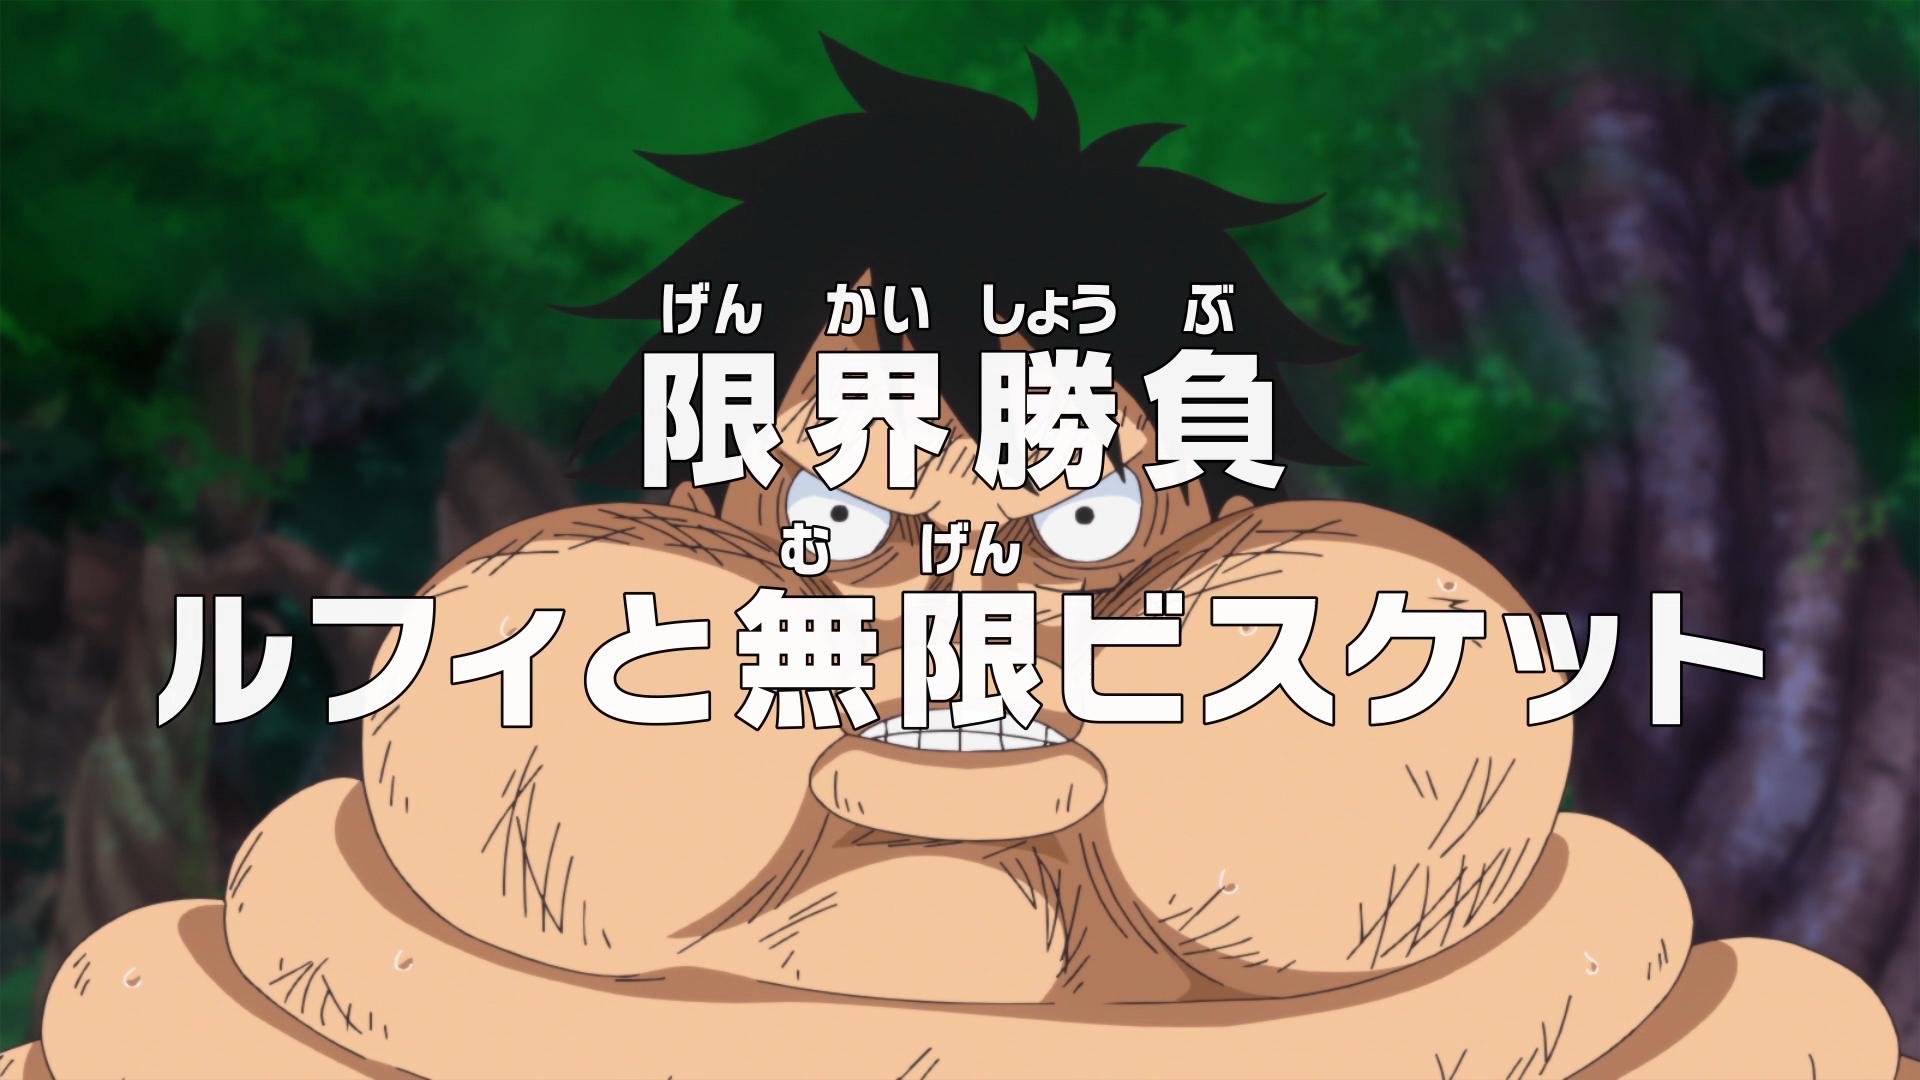 Episode 805